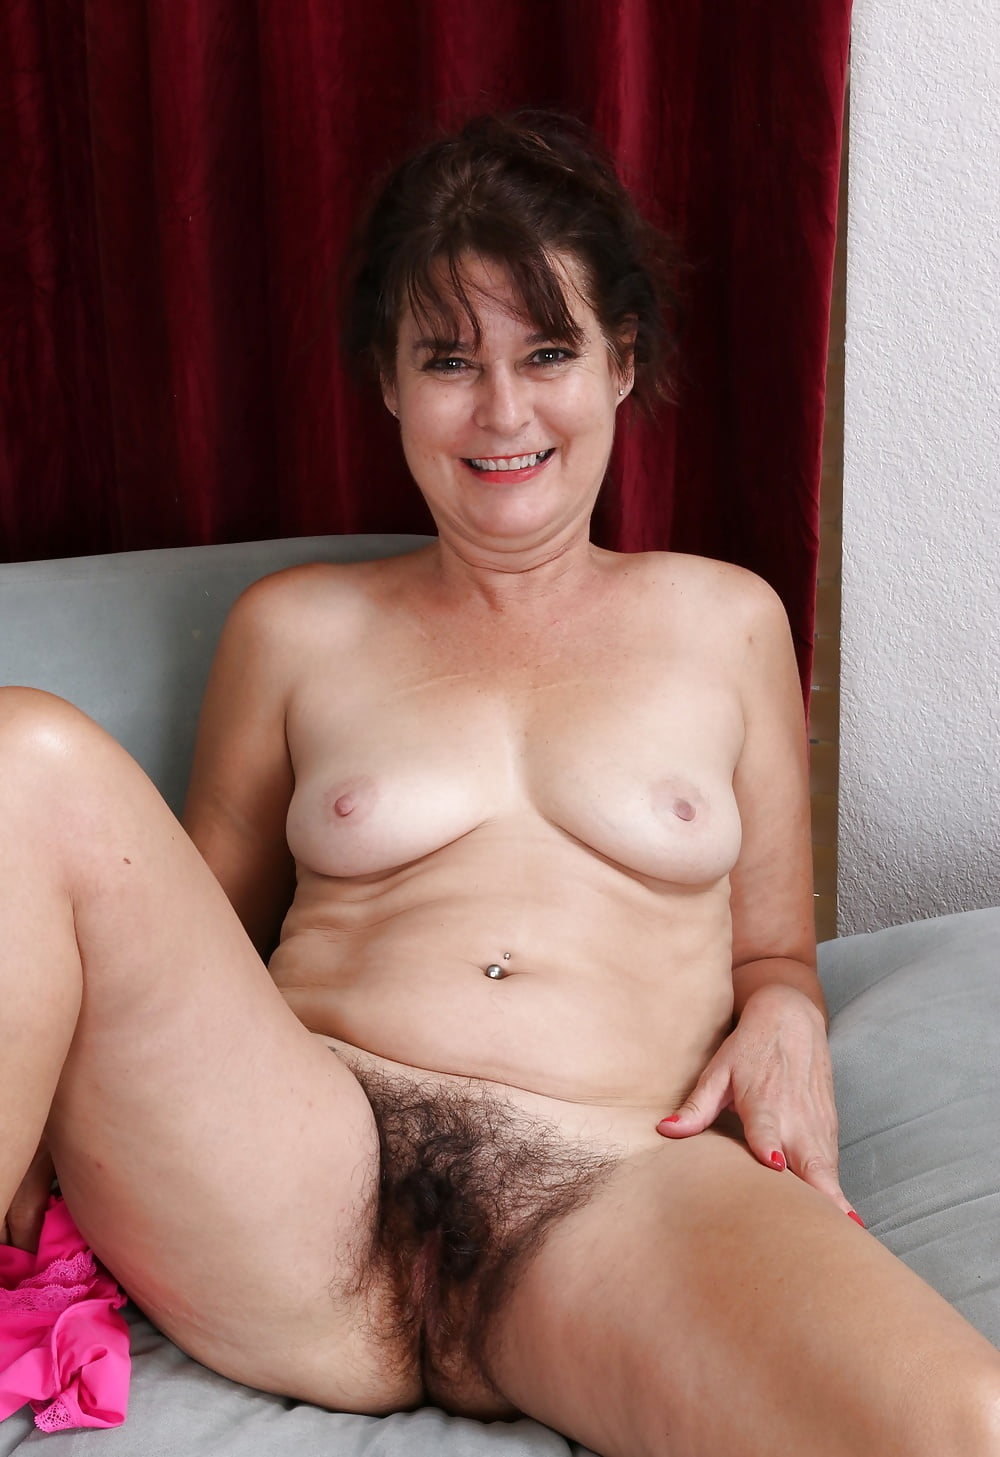 Hairy mature women, mature nude photos